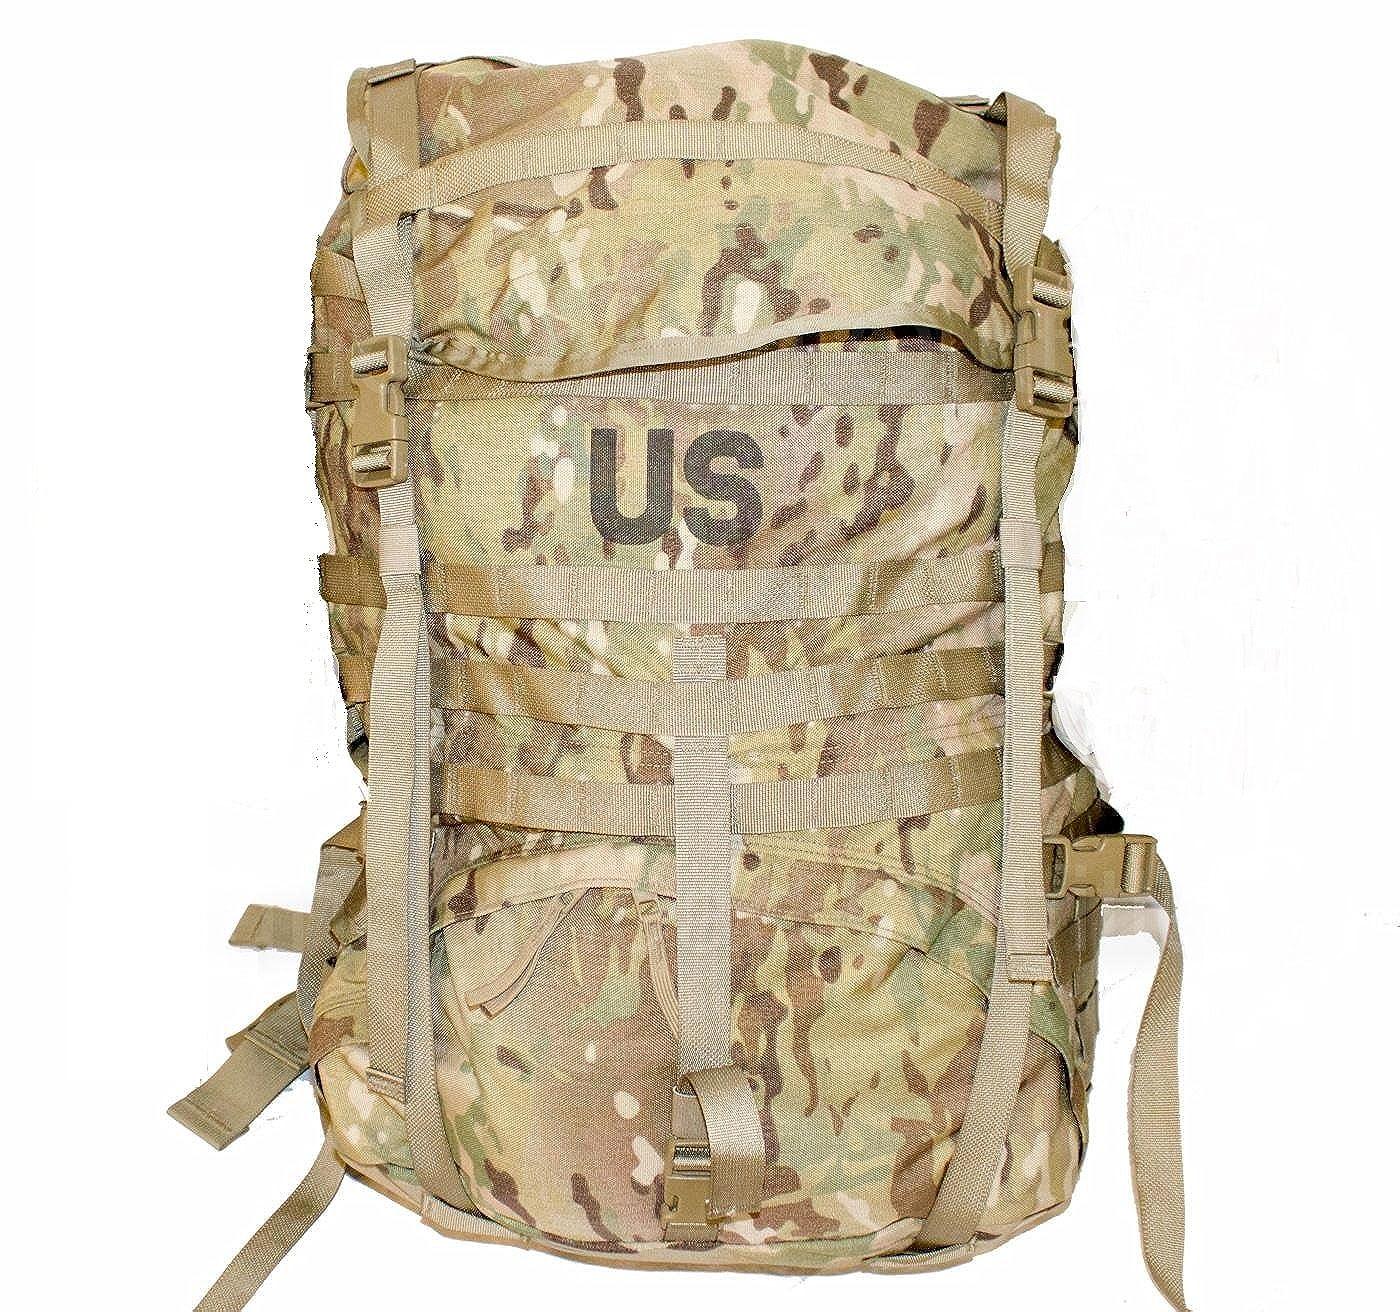 Amazon.com: MOLLE MultiCam (OCP) Large Rucksack, NSN 8465-01-580-1556 /  8465015801556 (USGI Issue Backpack) (MultiCam (OCP) (No Sustainment  Pouches)): ...